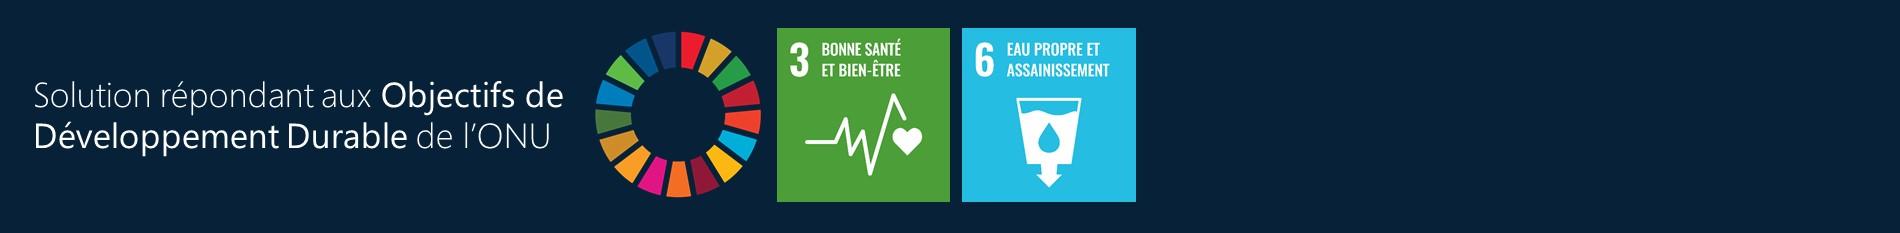 Objectifs Developpement Durable ONU PMR